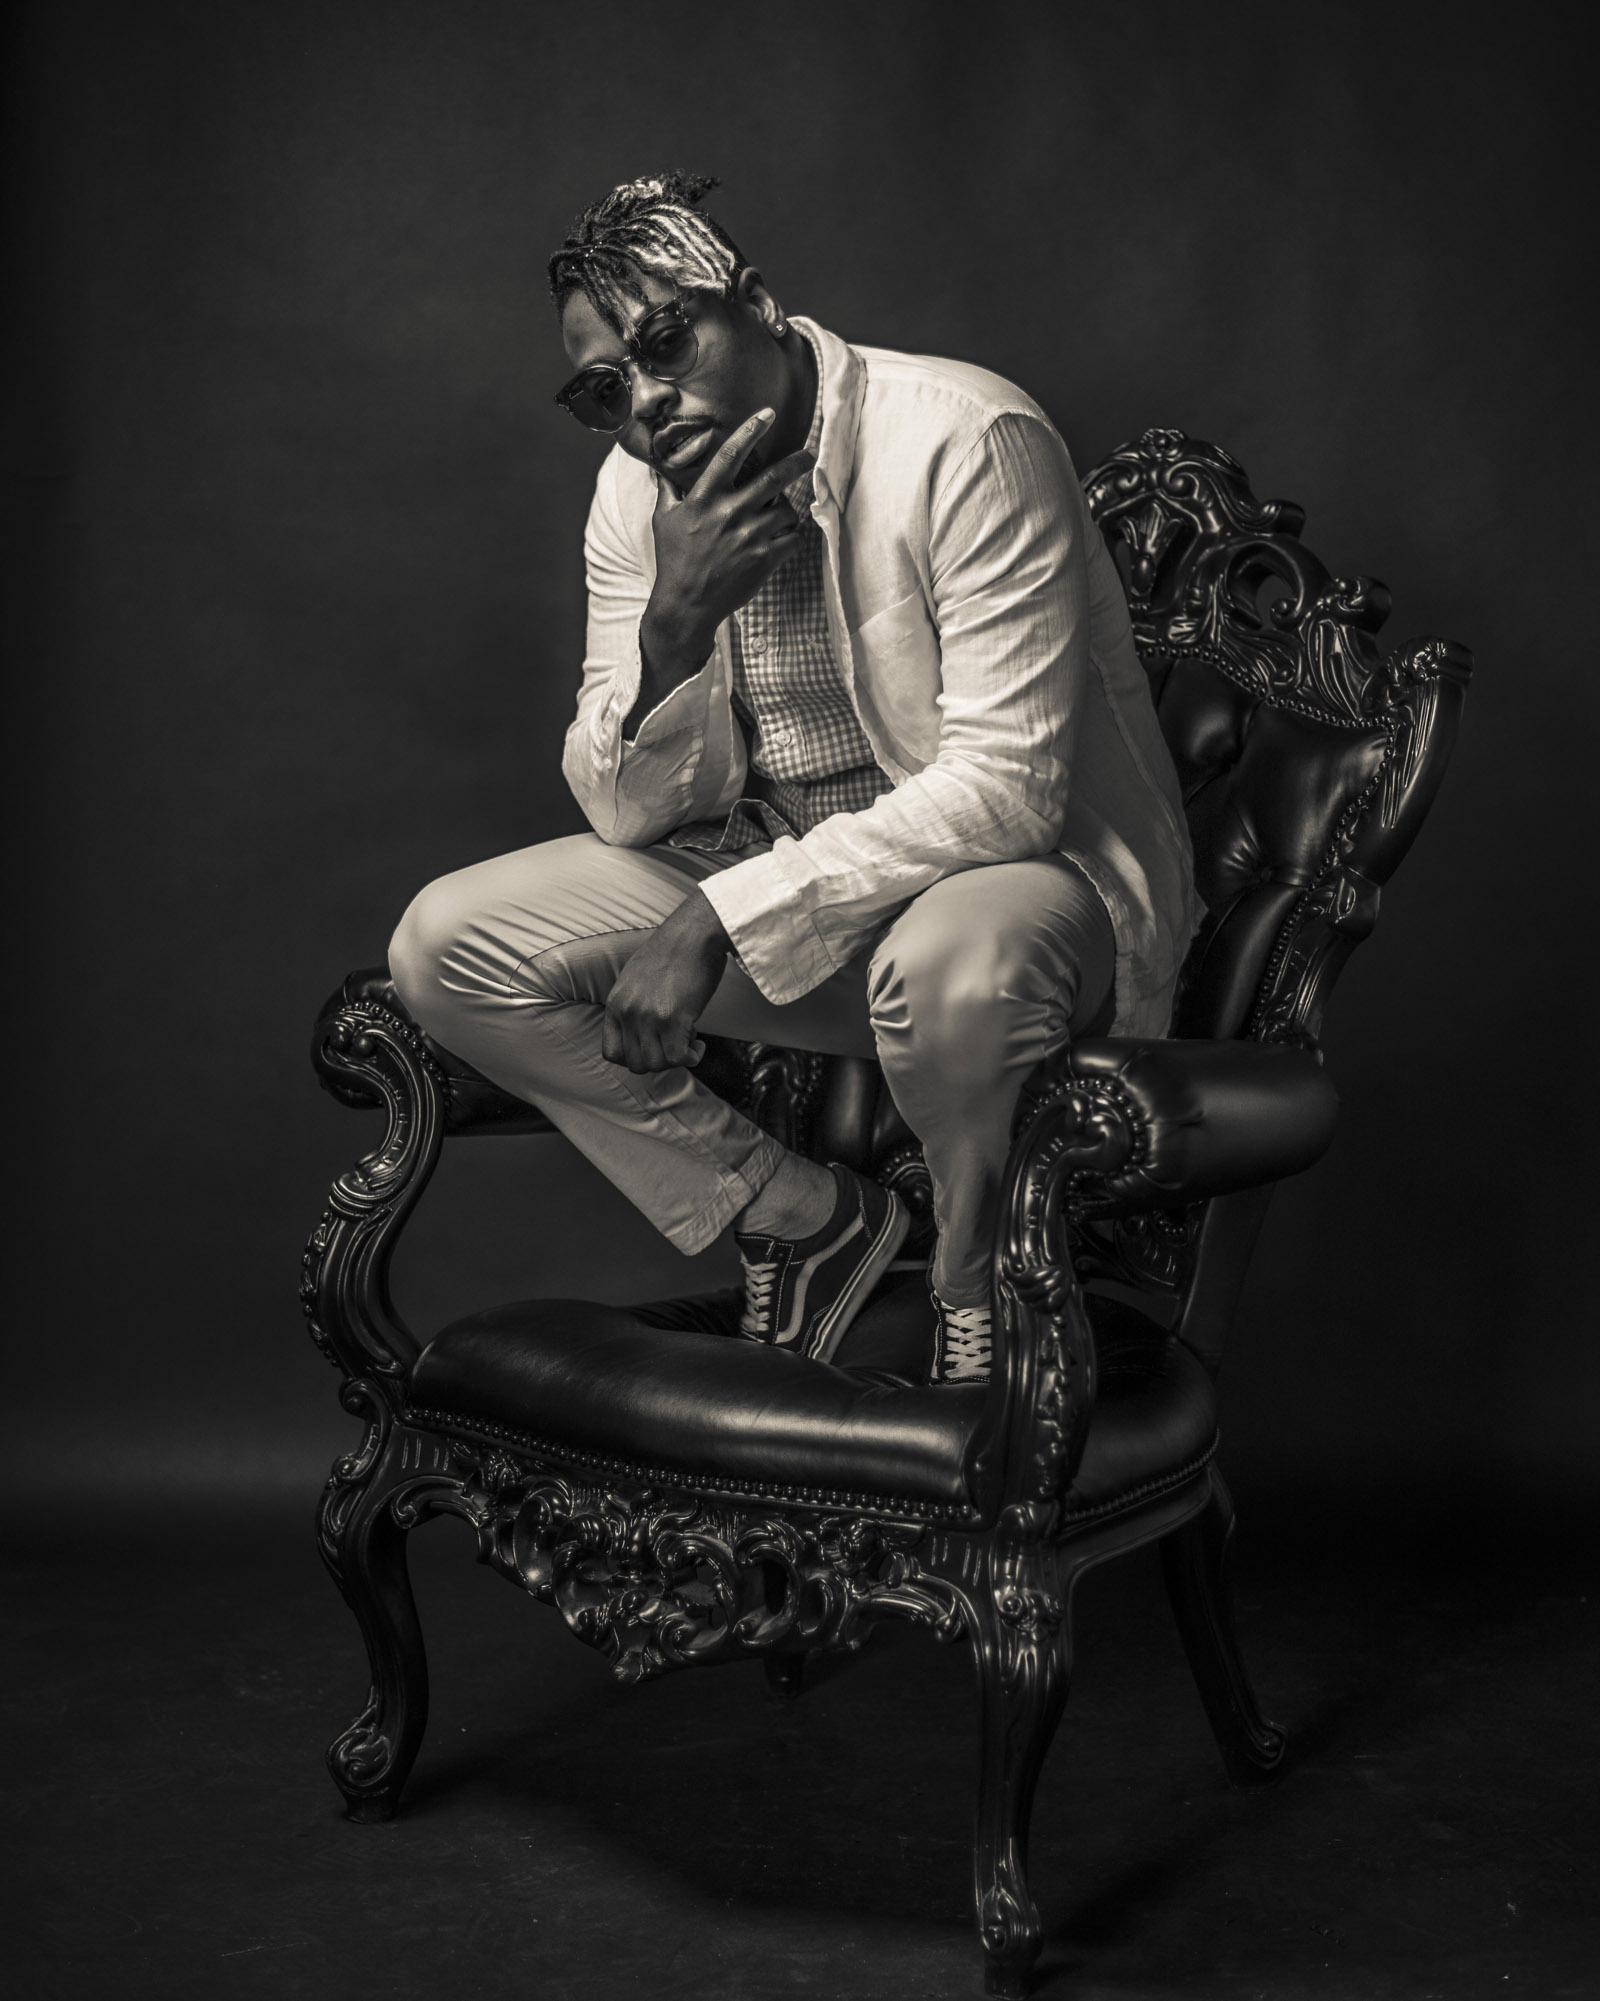 Spirit-&-Flesh-Magazine_King-ARod_by-David-Carlo_007